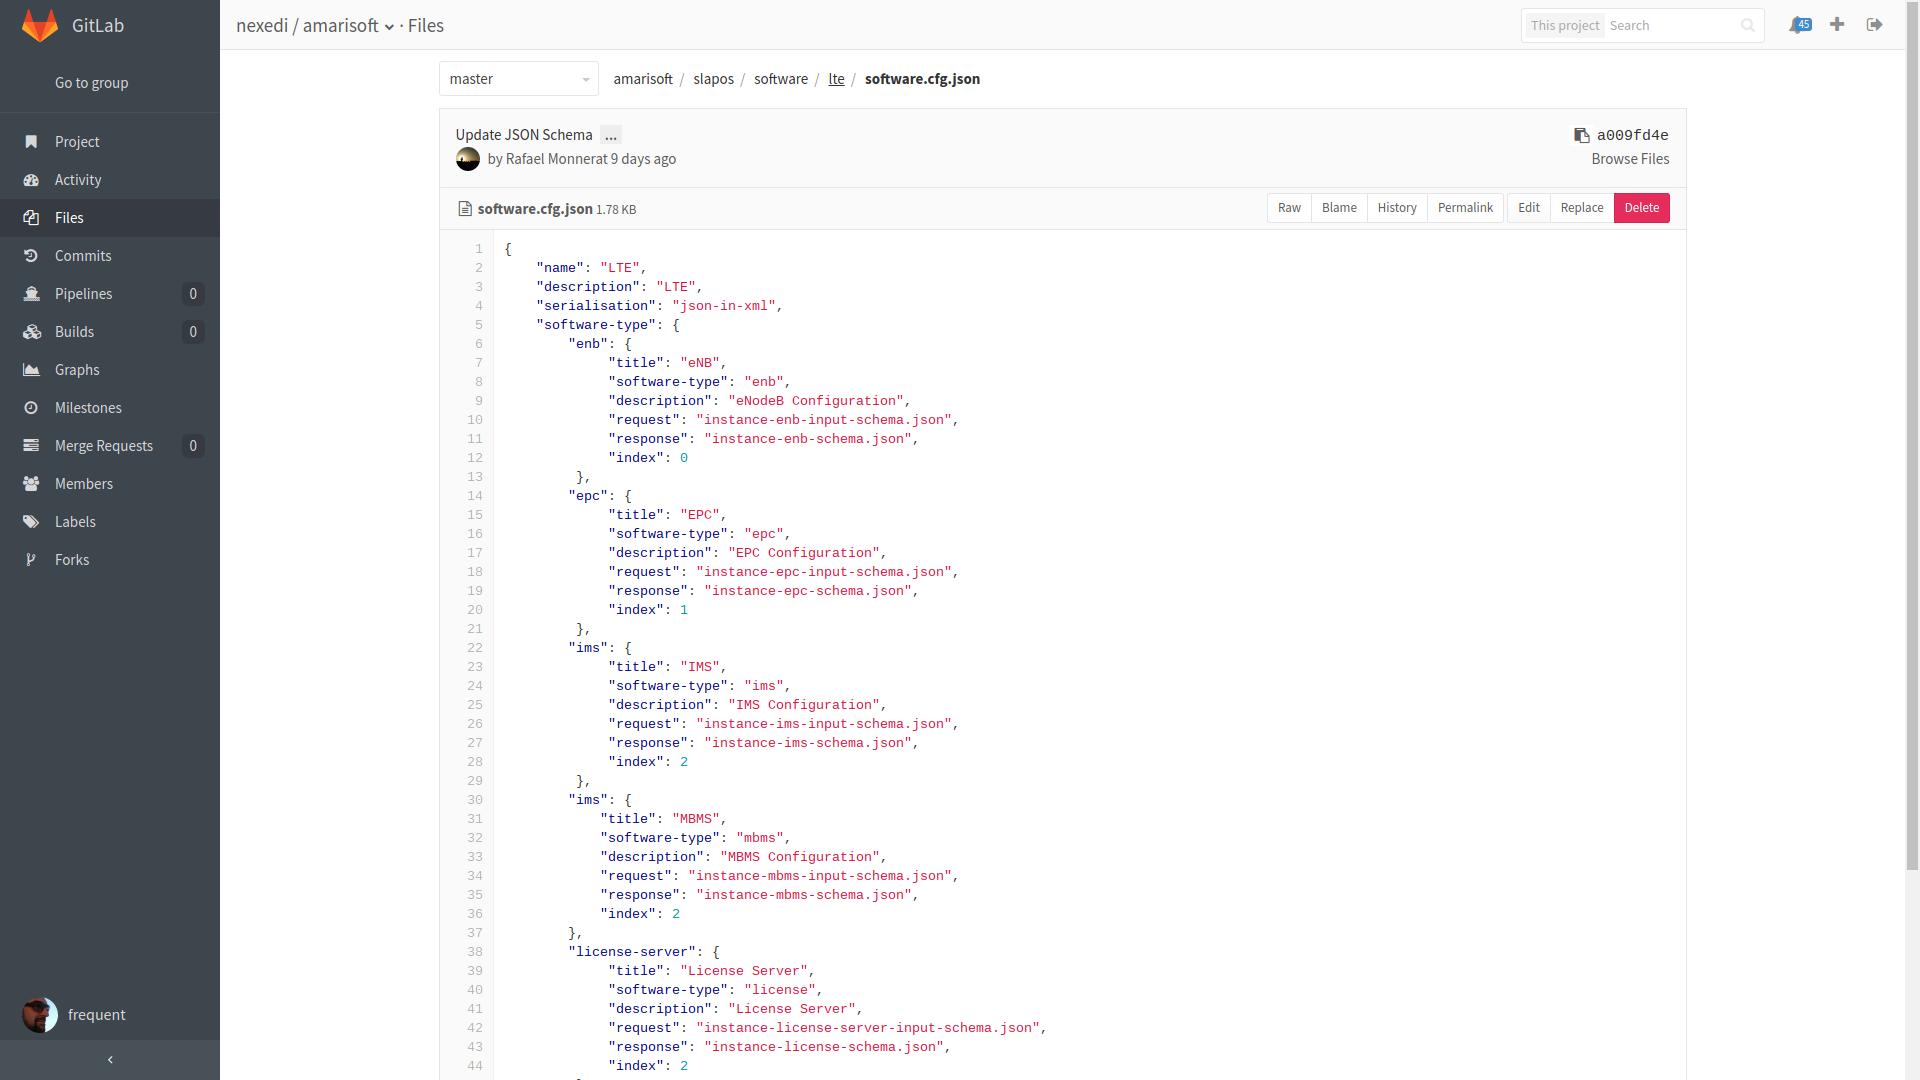 Gitlab Interface - LTE Software Profile (JSON)